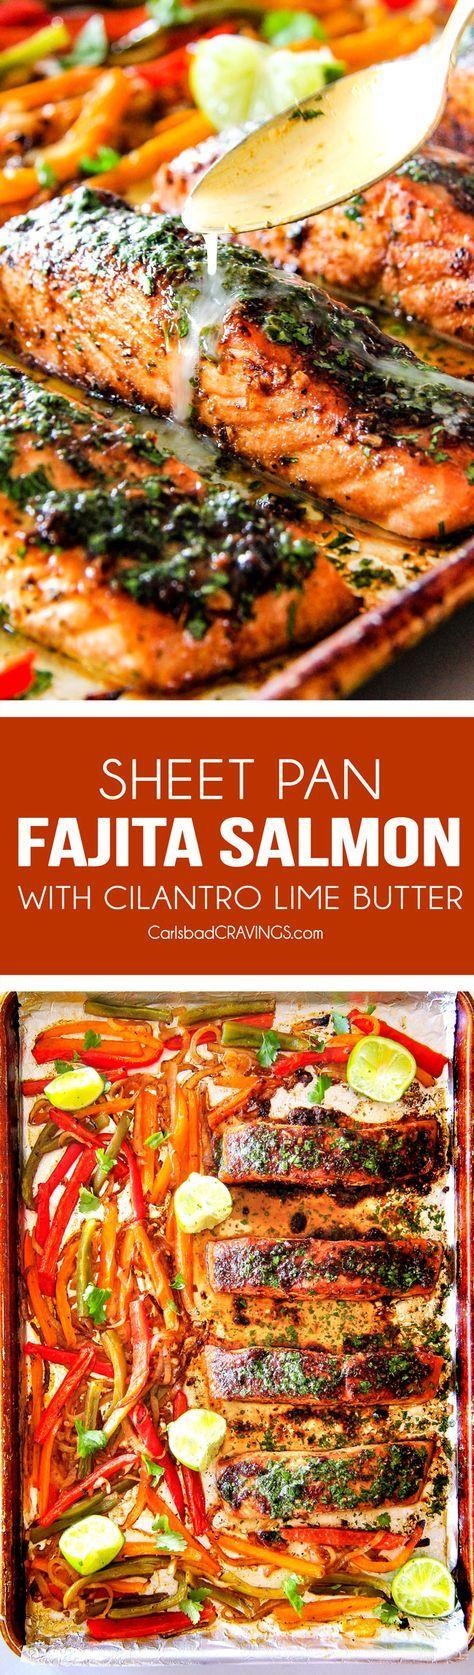 Slow Cooker: Sheet Pan Fajita Salmon with Cilantro Lime Butter ...